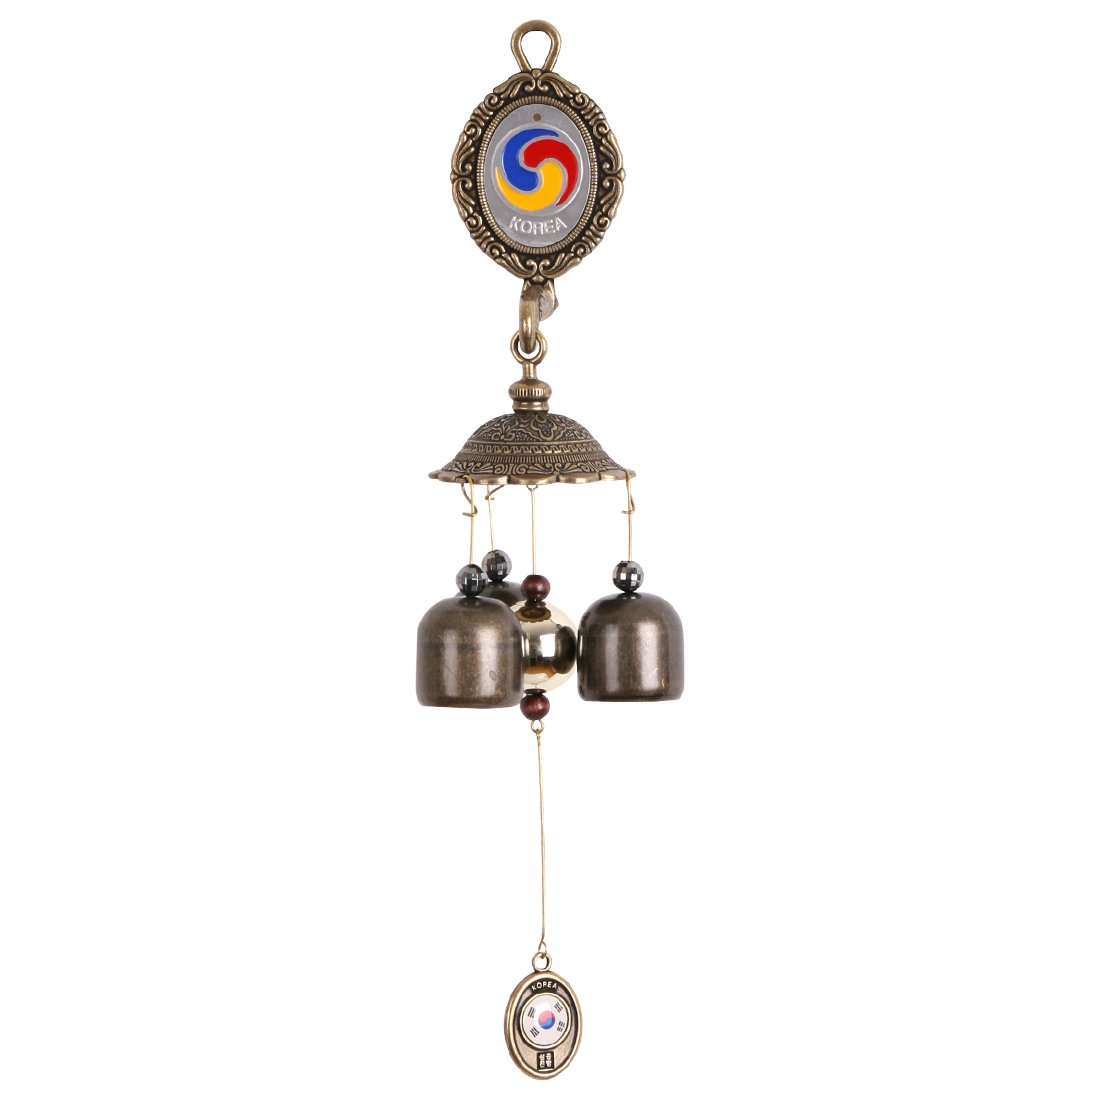 Cast Vintage Antique Brass Taeguk Door Bell Shop keeper